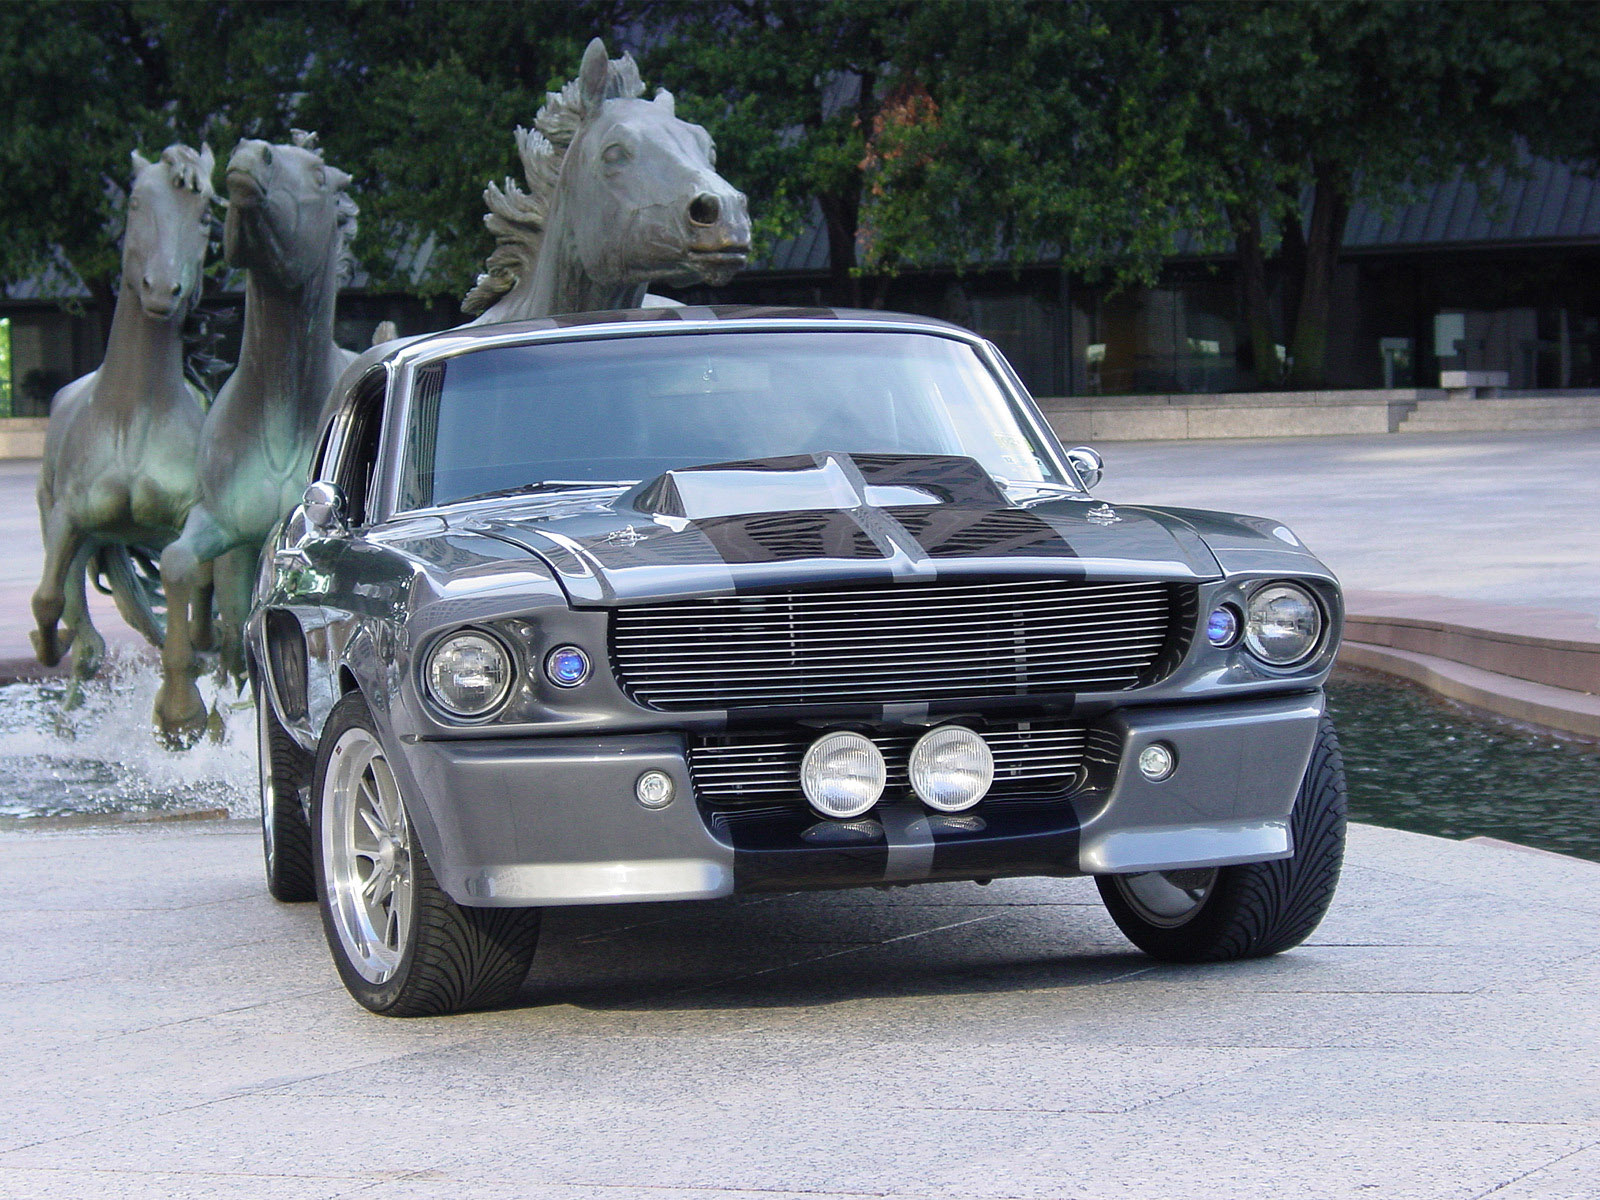 1967 Shelby Cobra Mustang GT500 Eleanor